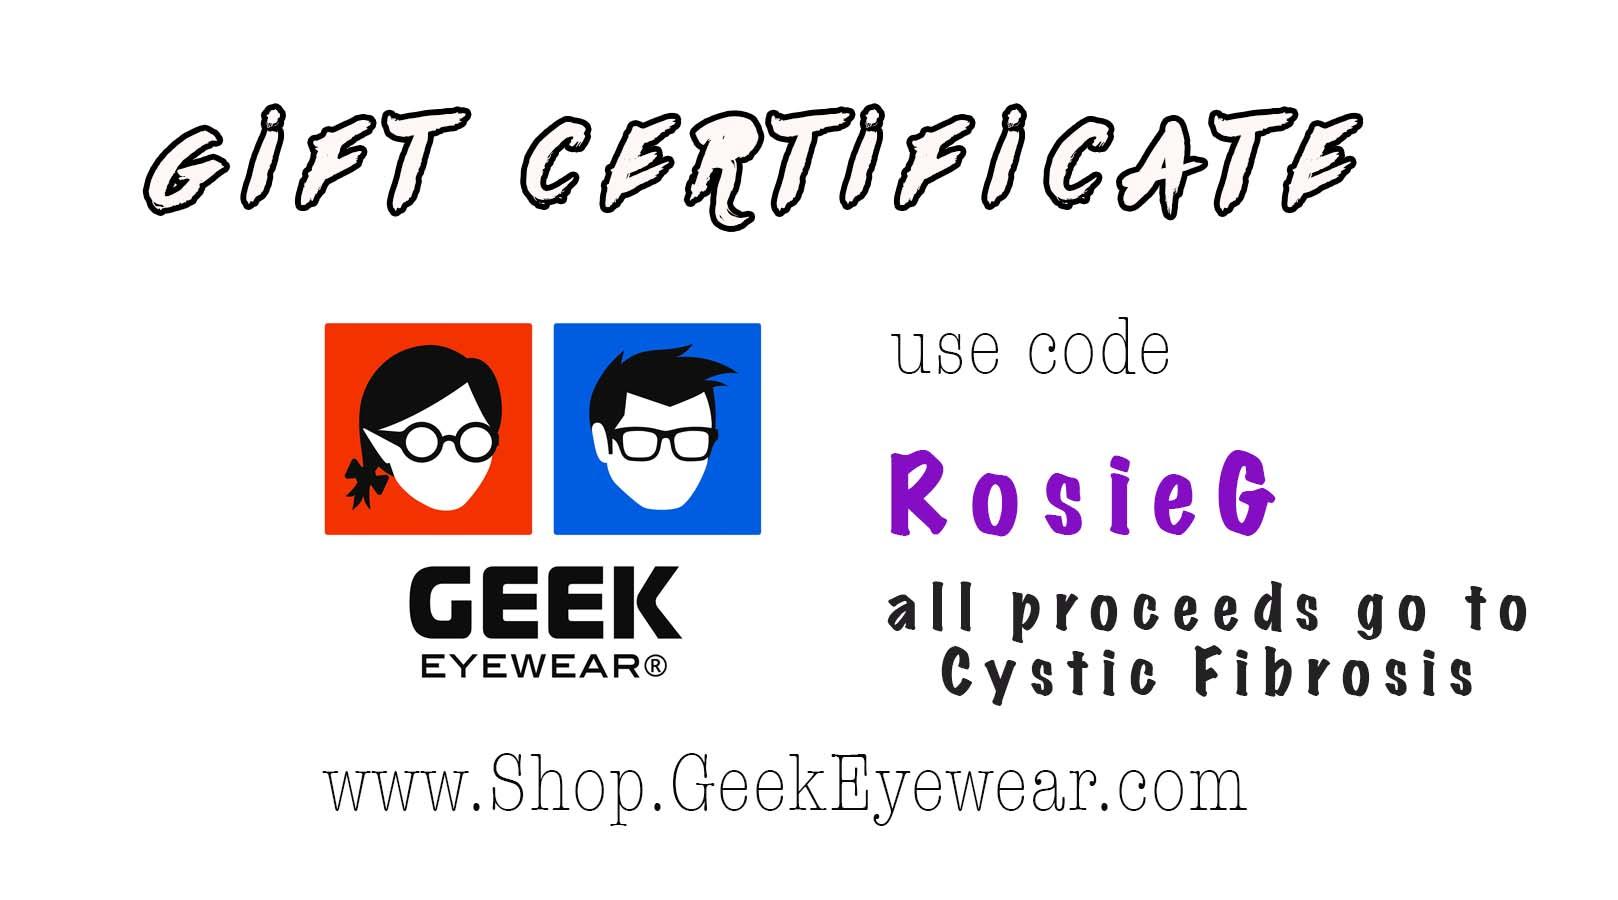 gift-certificate-geek-eyewear-web.jpg